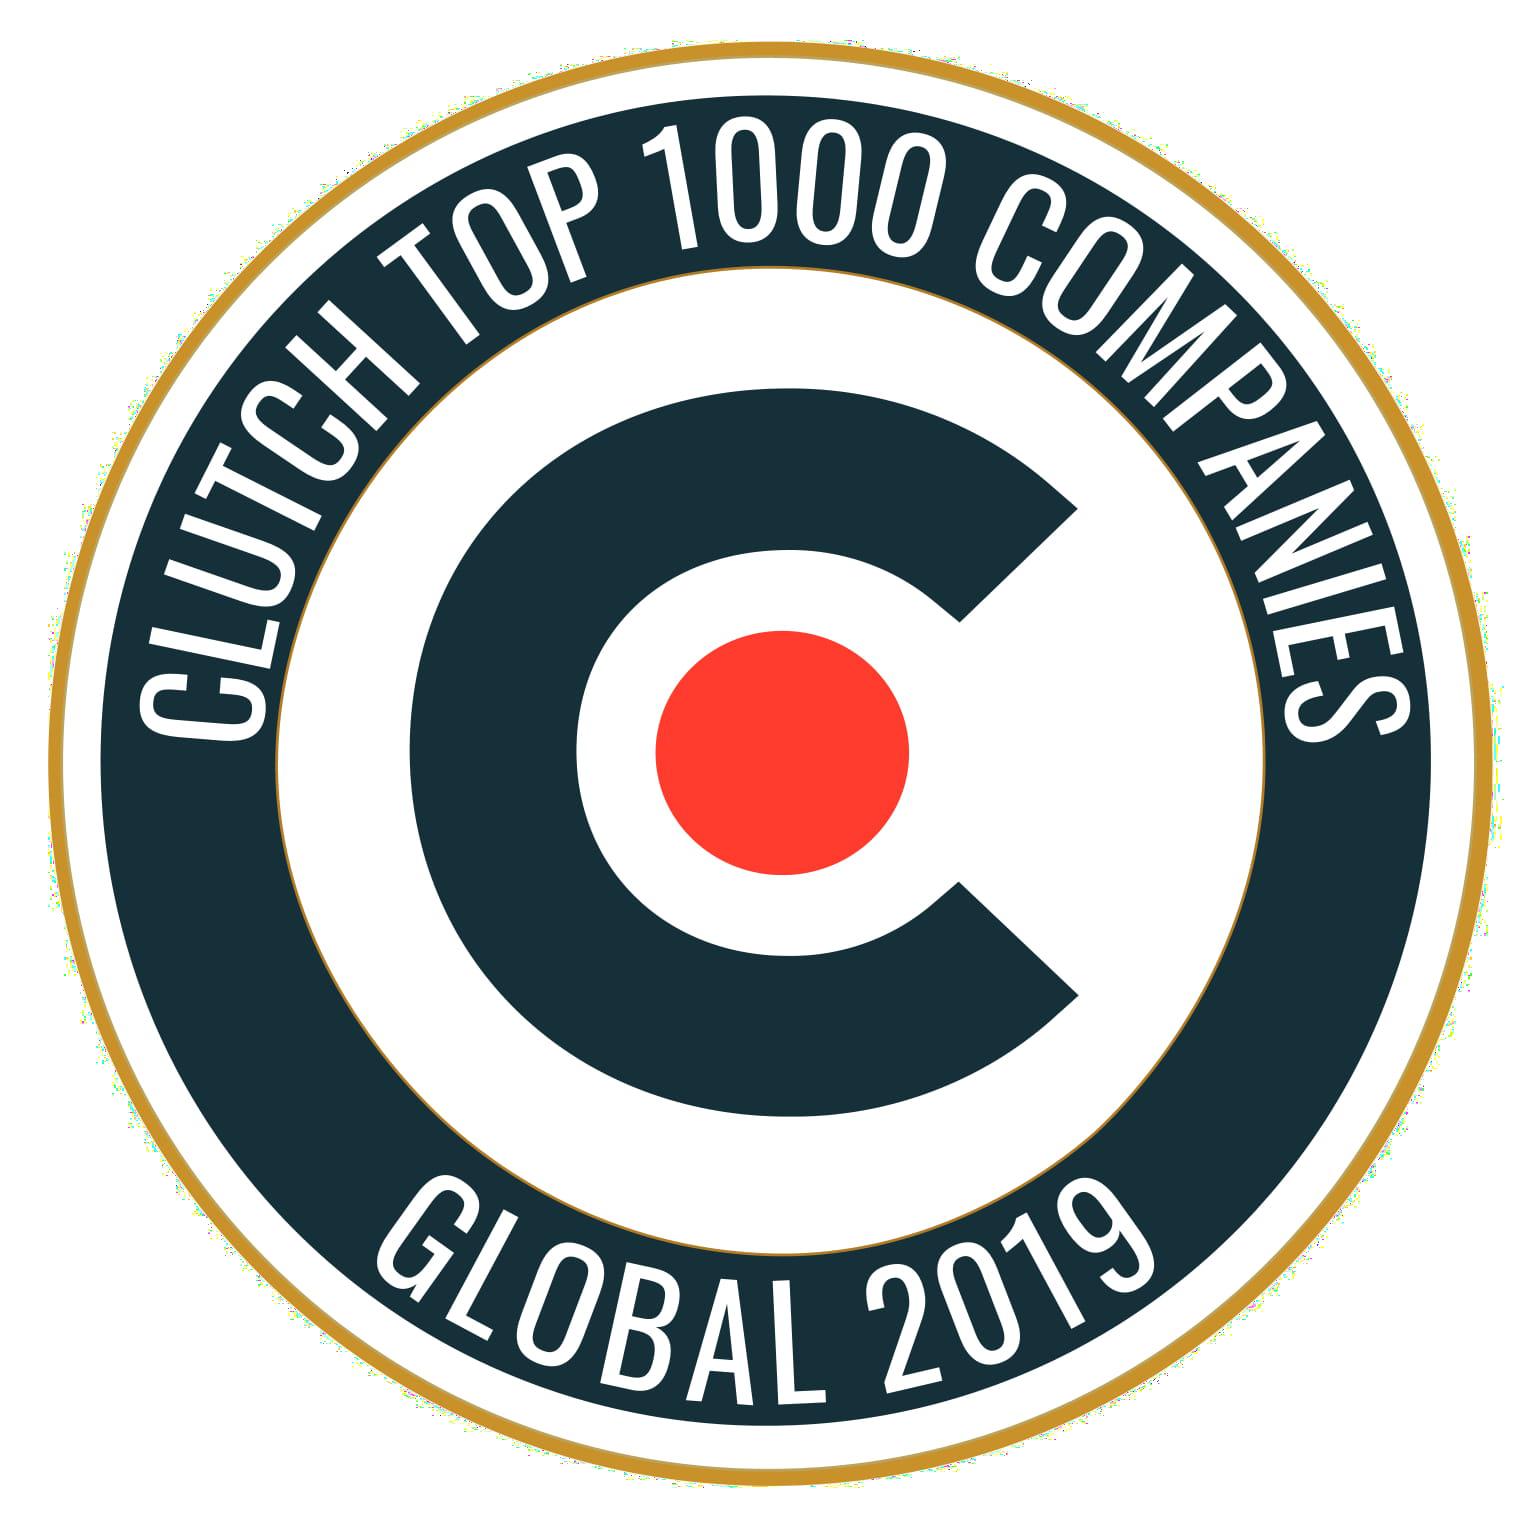 Cubix named a Clutch 1000 company!